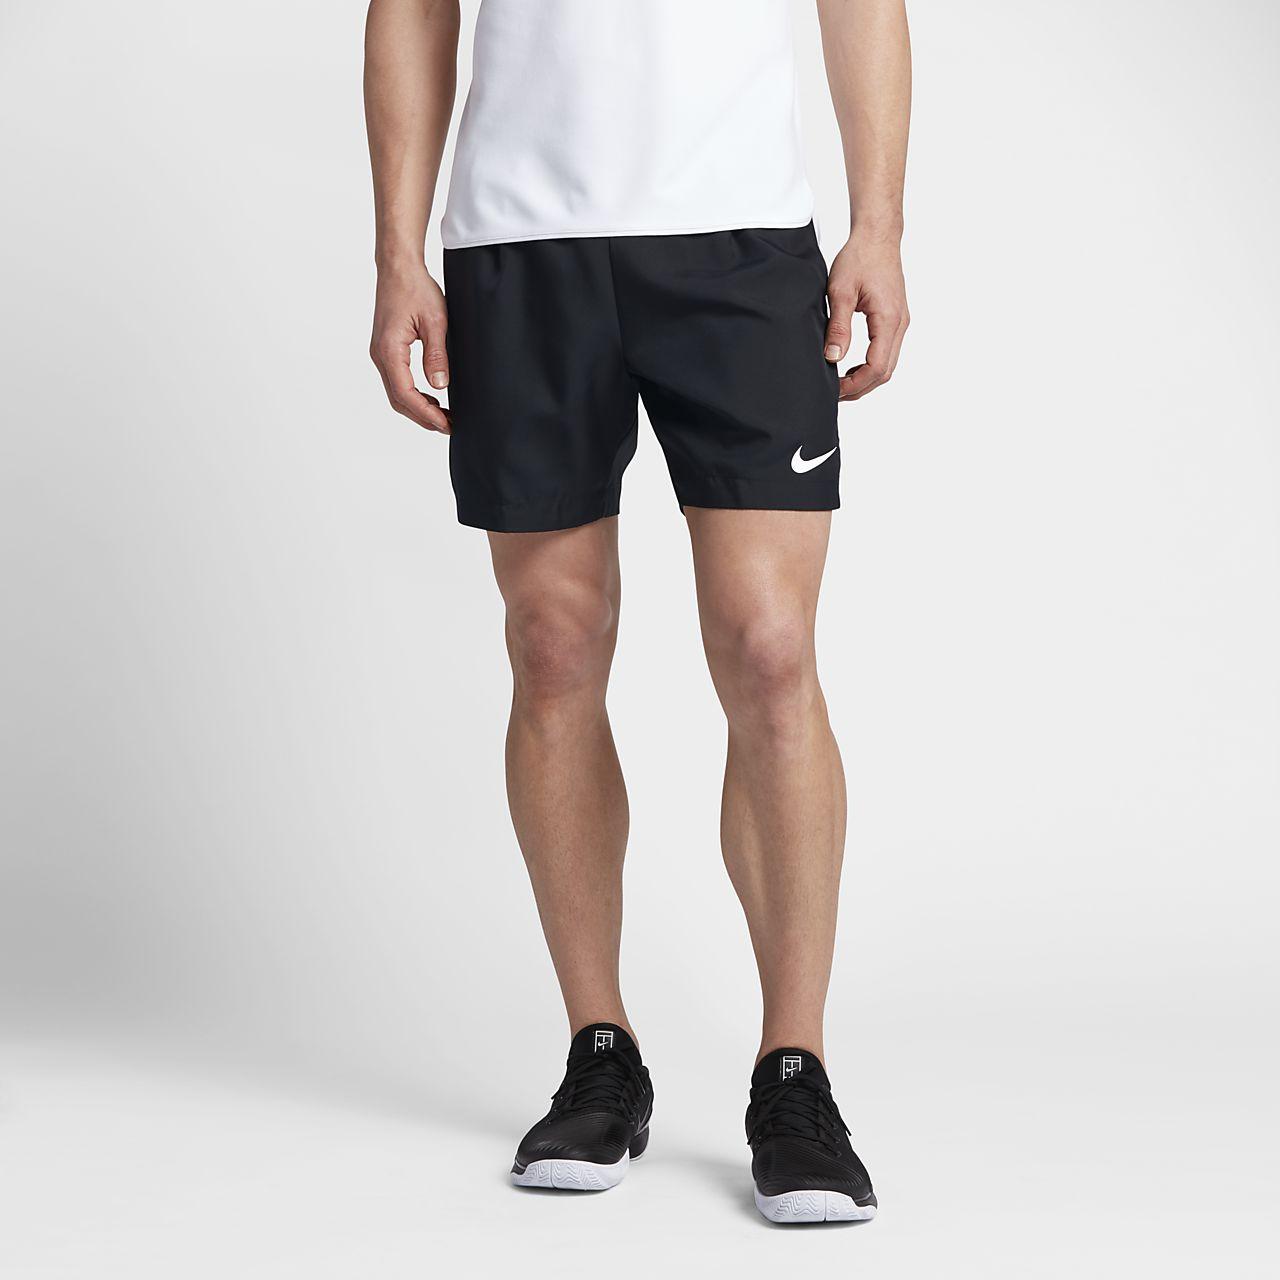 "NikeCourt Dry Men's 7"" (18cm approx.) Tennis Shorts"